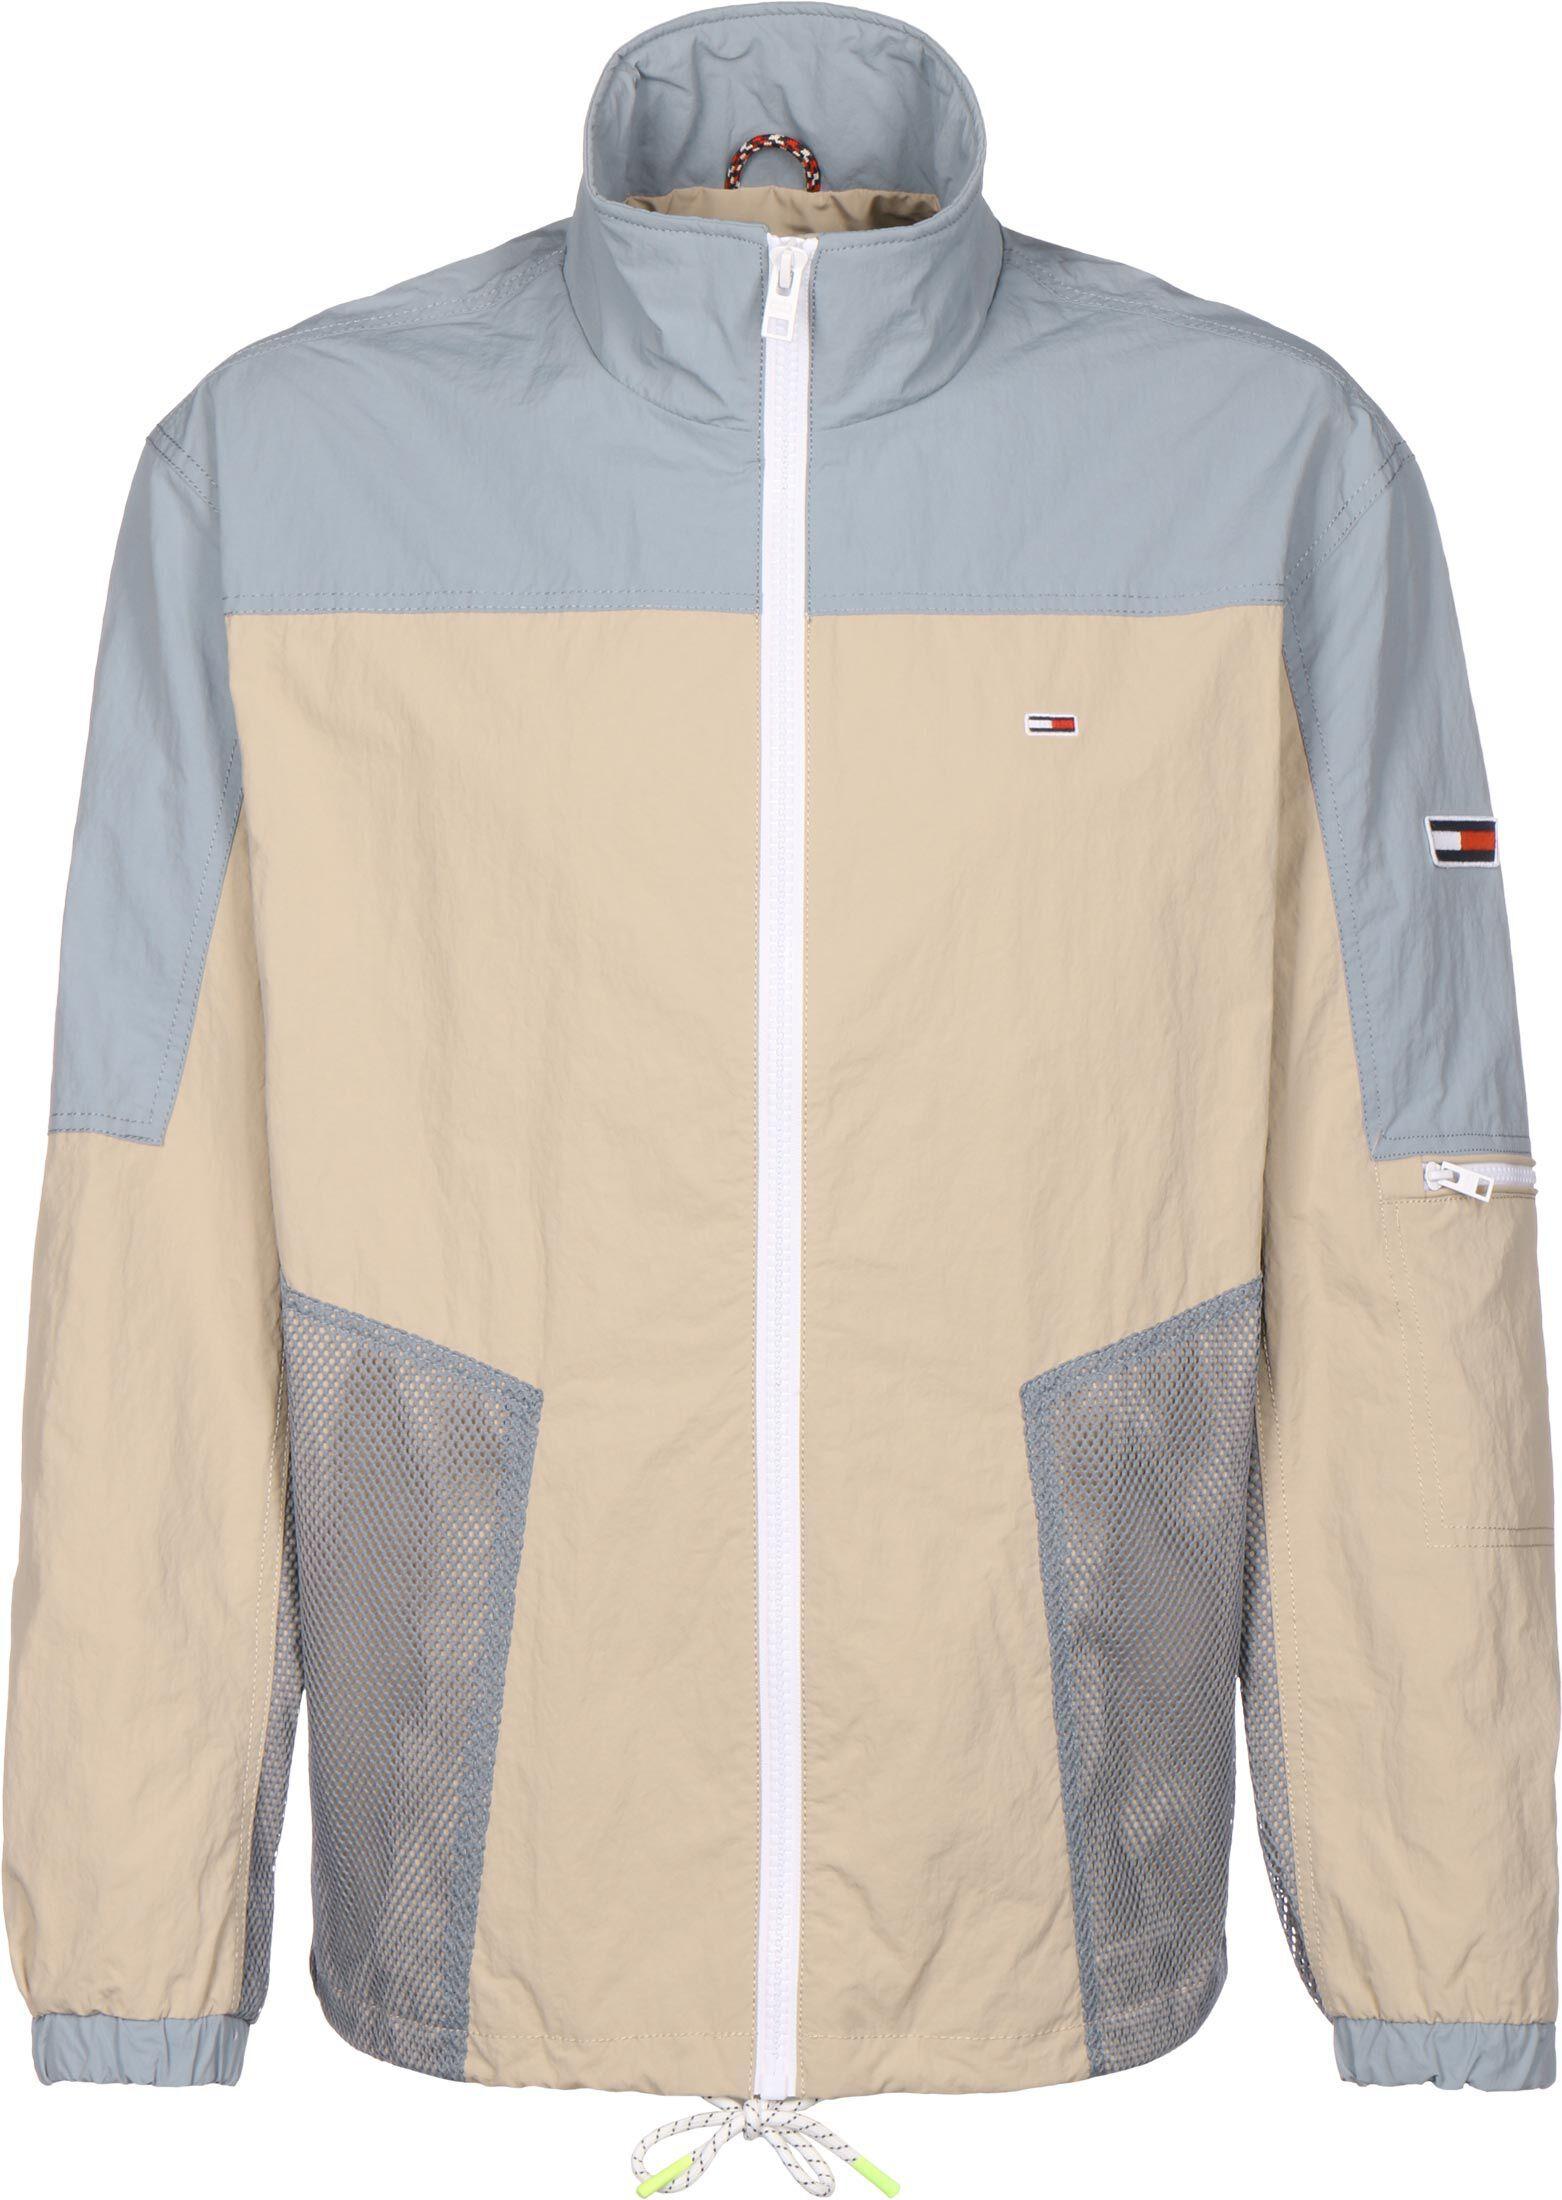 Tommy Jeans Mix Media Colorblock, taille M, homme, beige bleu